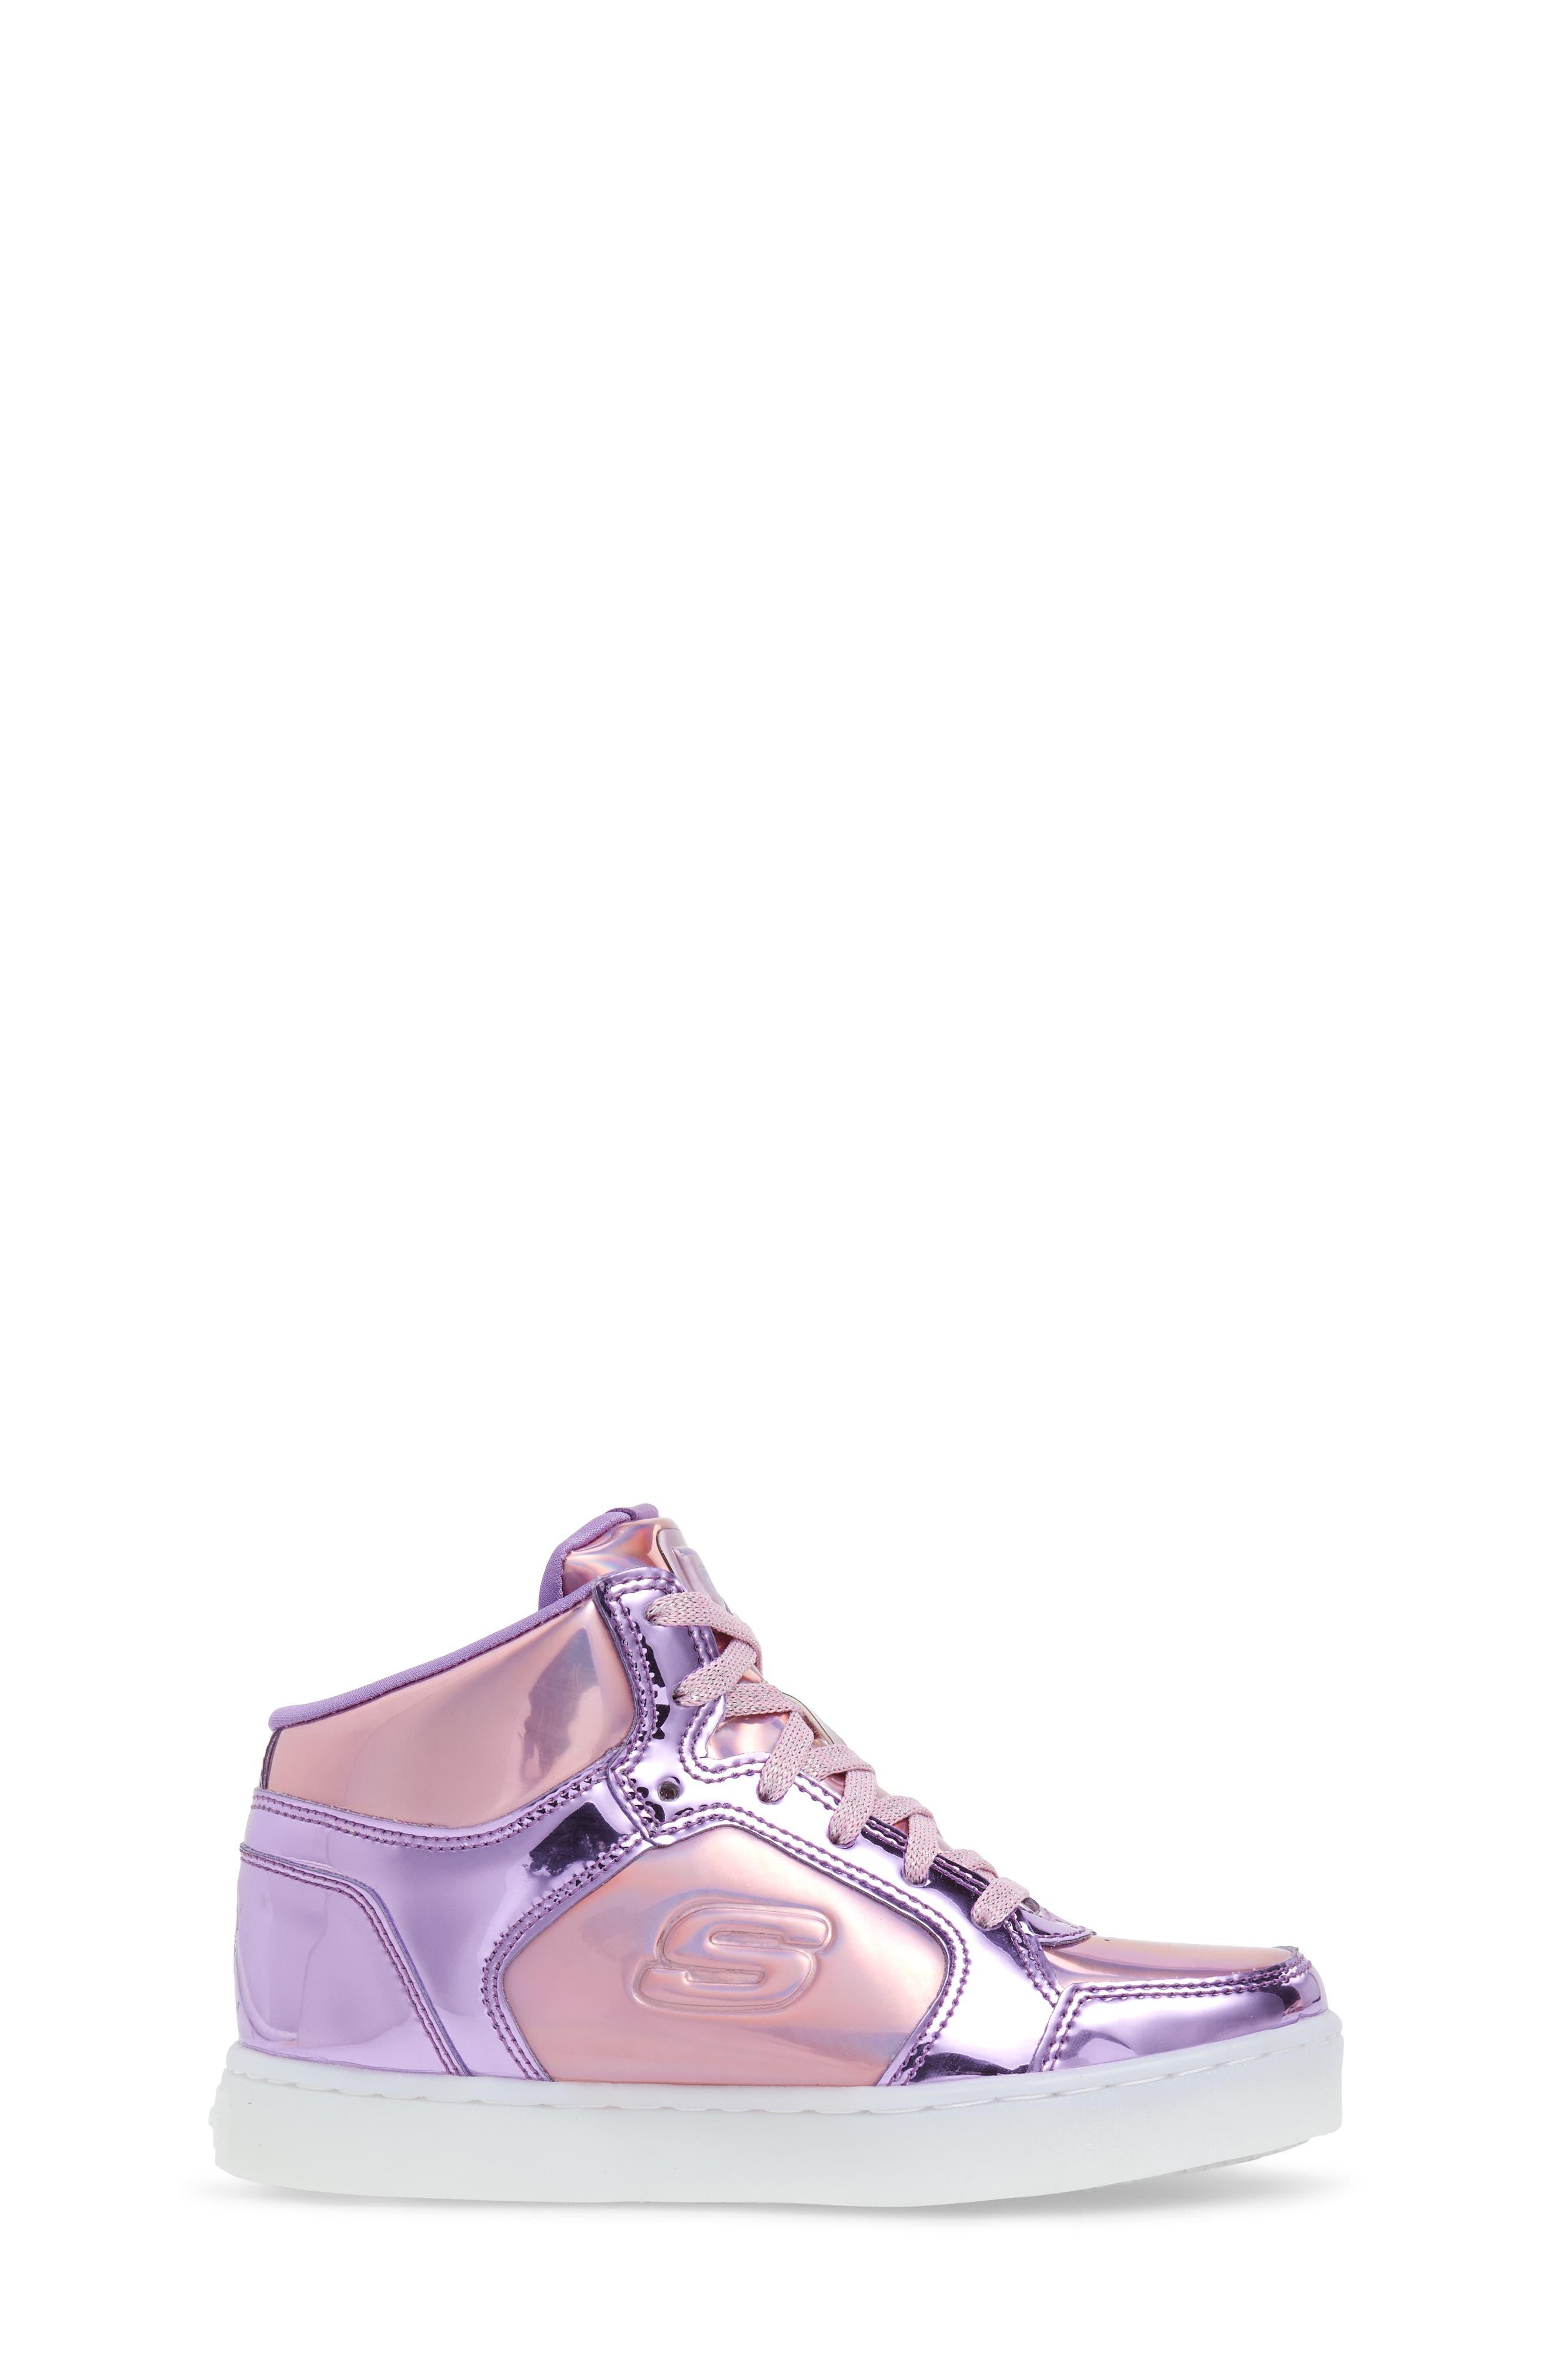 Energy Lights Metallic High Top Sneaker,                             Alternate thumbnail 5, color,                             Pink/ Purple